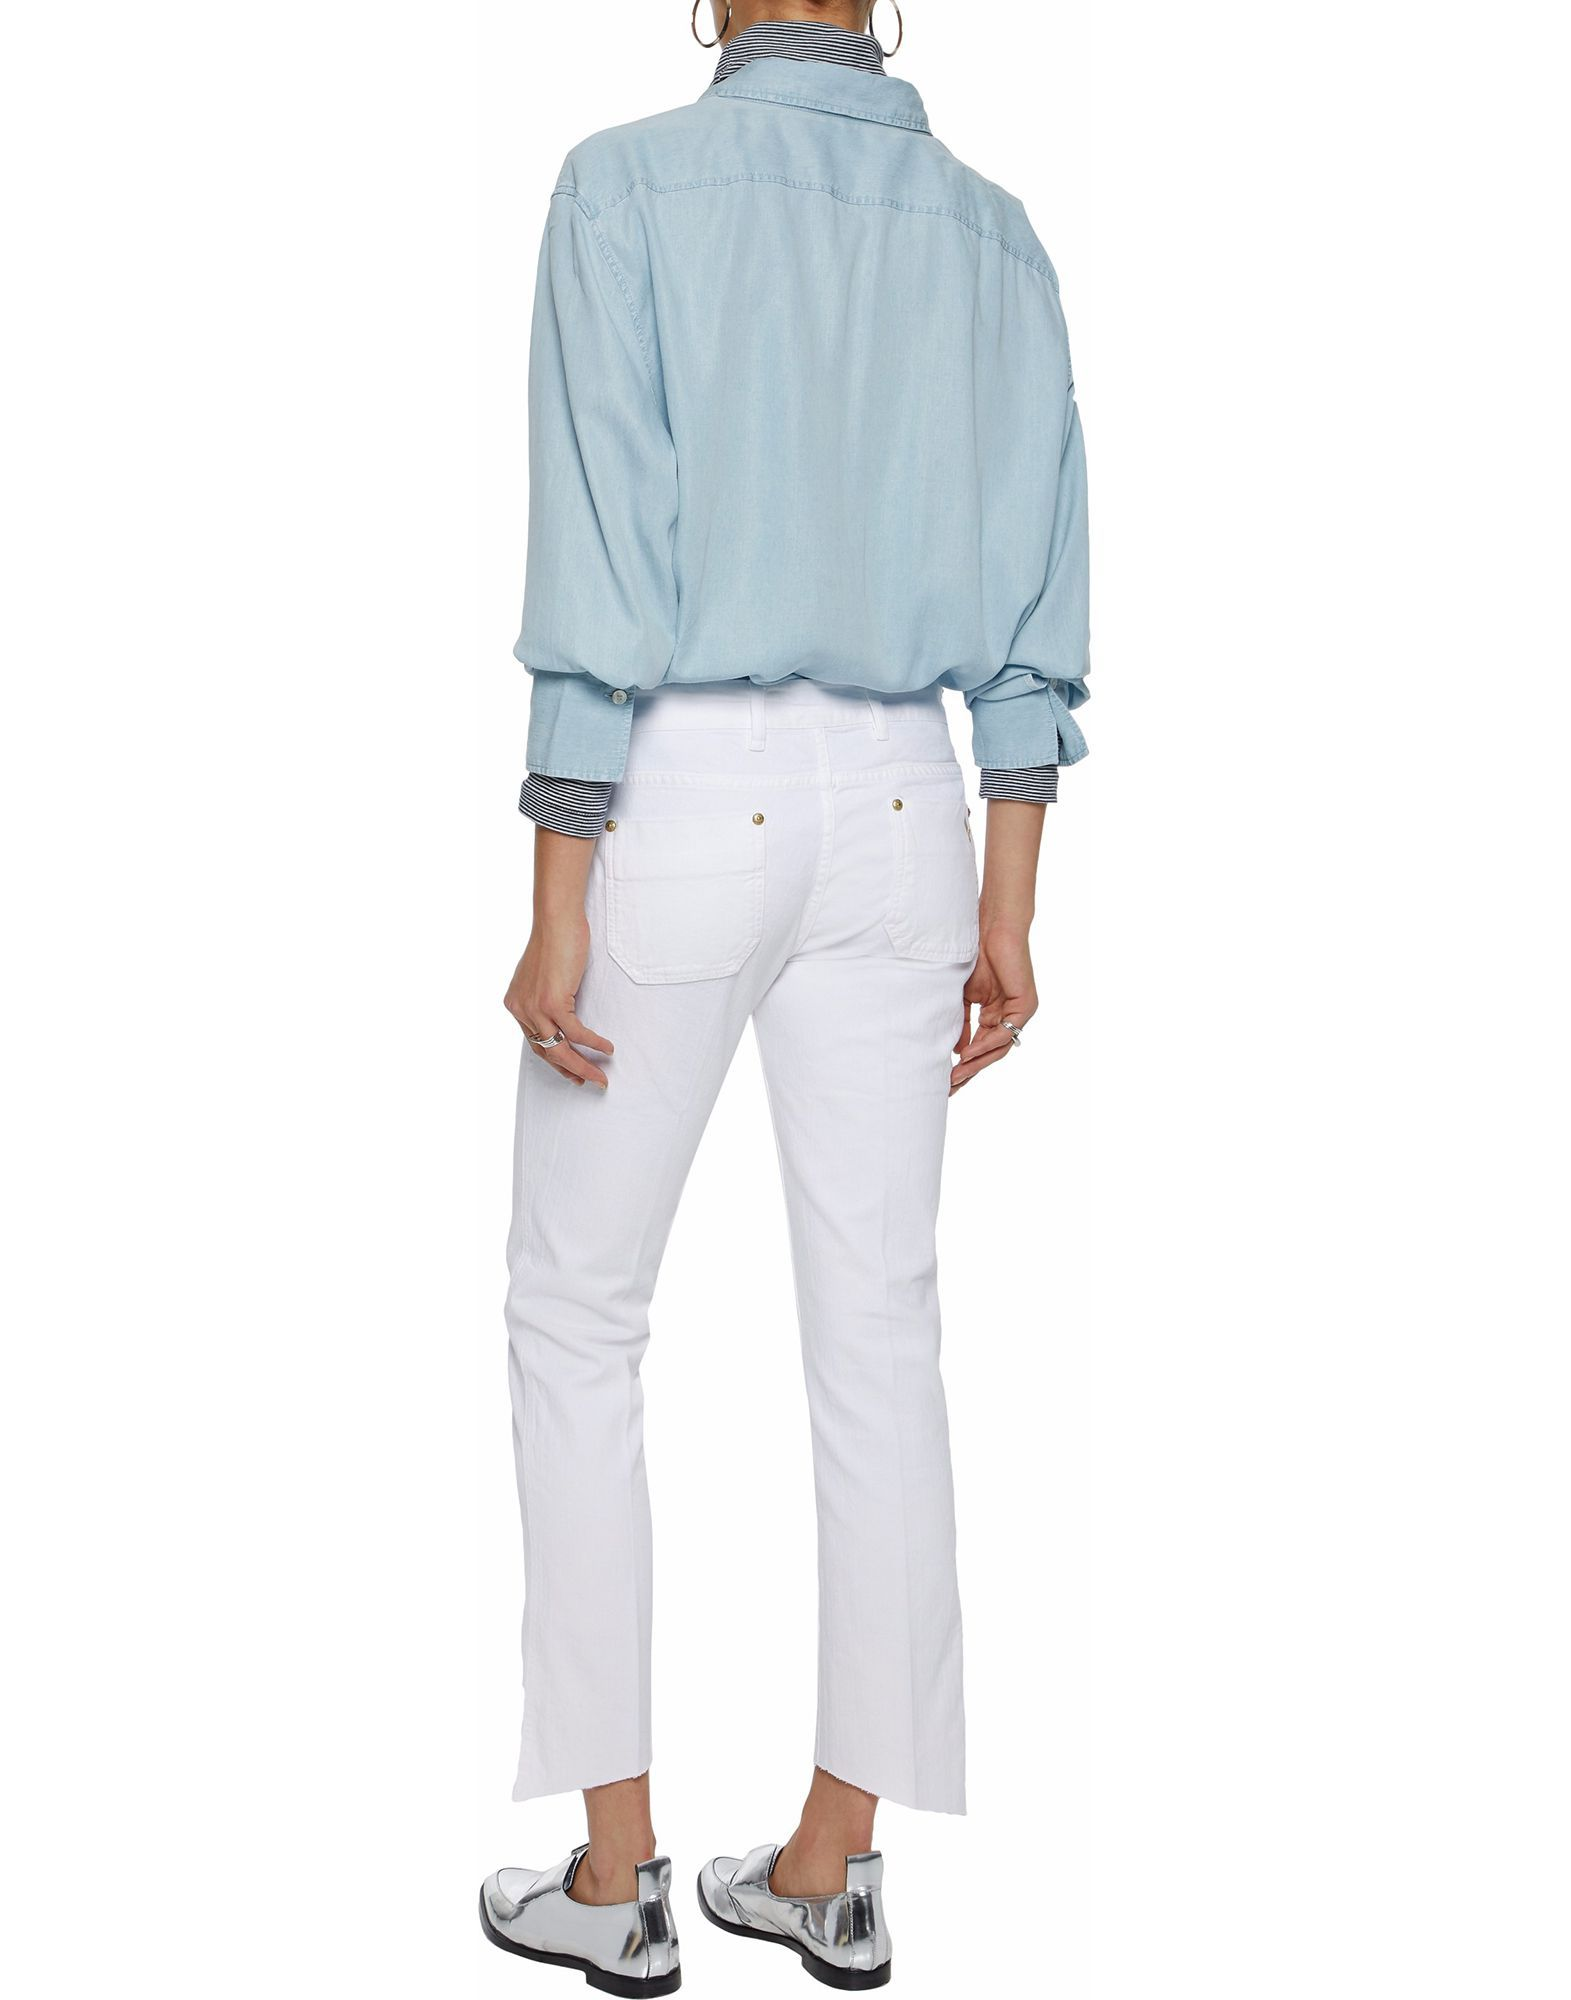 M.I.H Jeans White Cotton Jeans